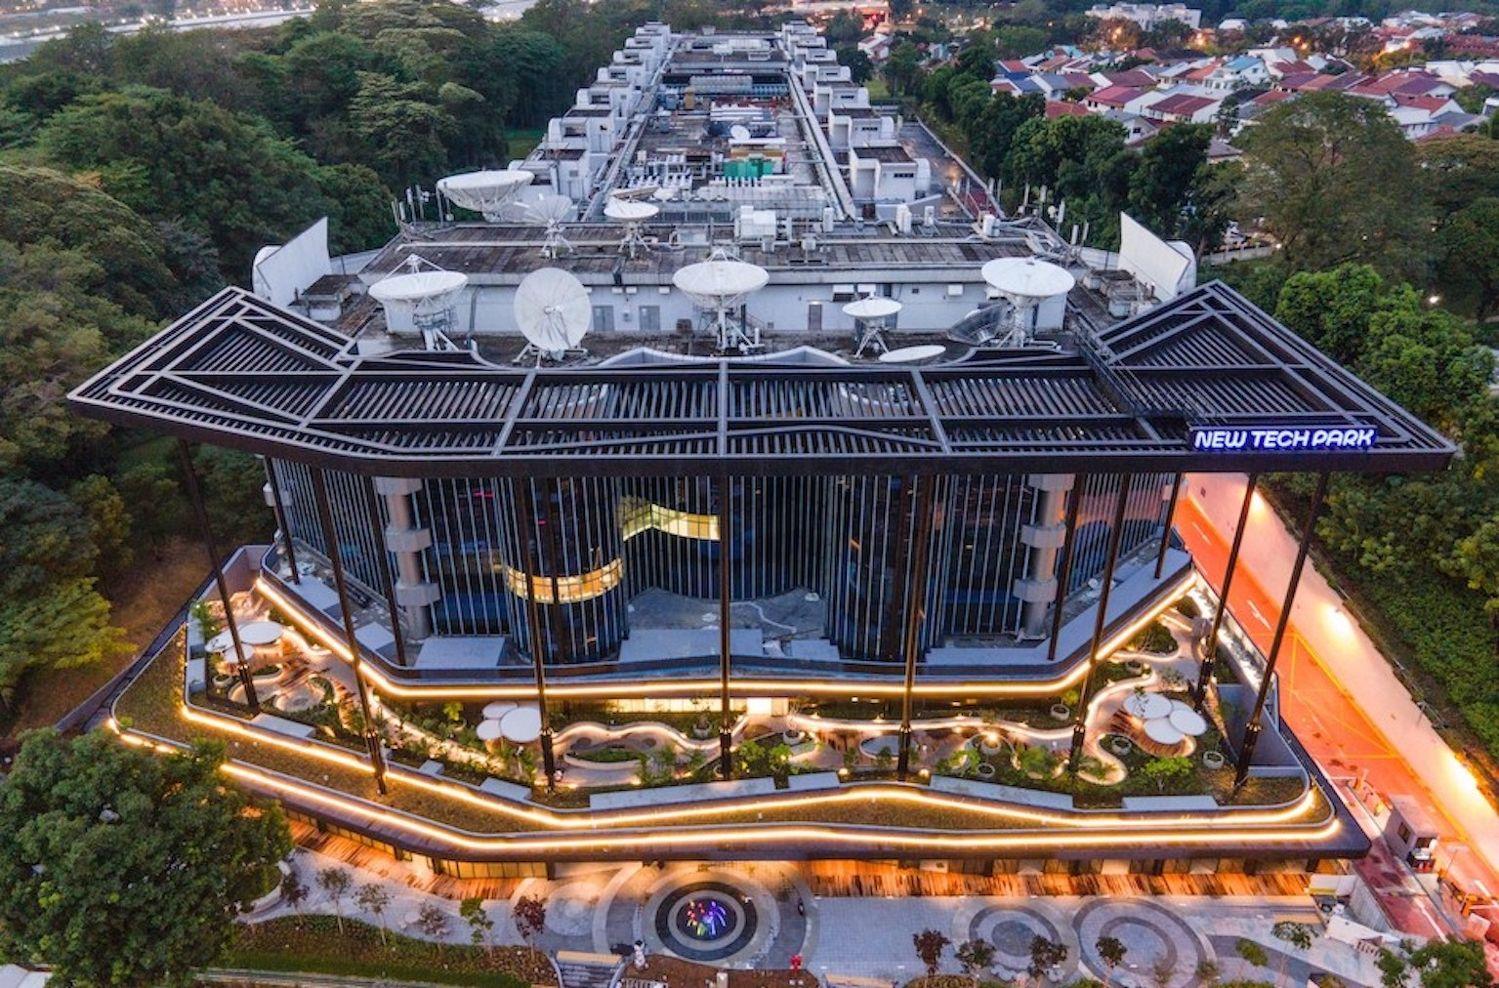 AERIAL-VIEW-NTP - EDGEPROP SINGAPORE